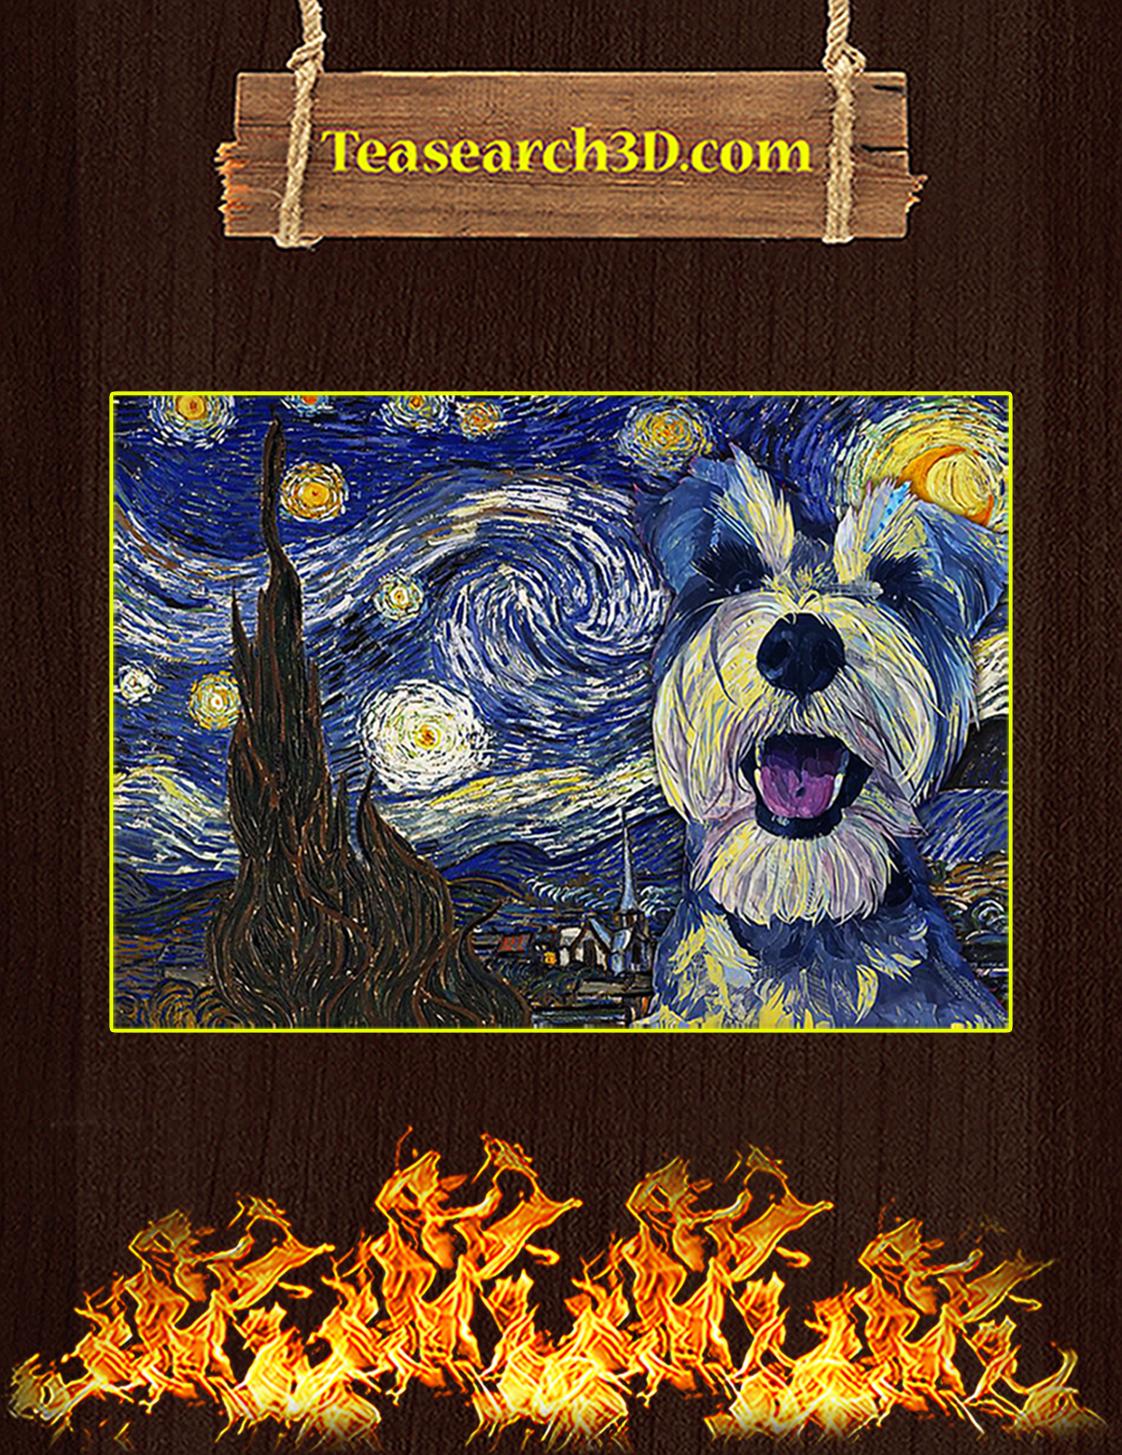 Schnauzer starry night van gogh poster A3